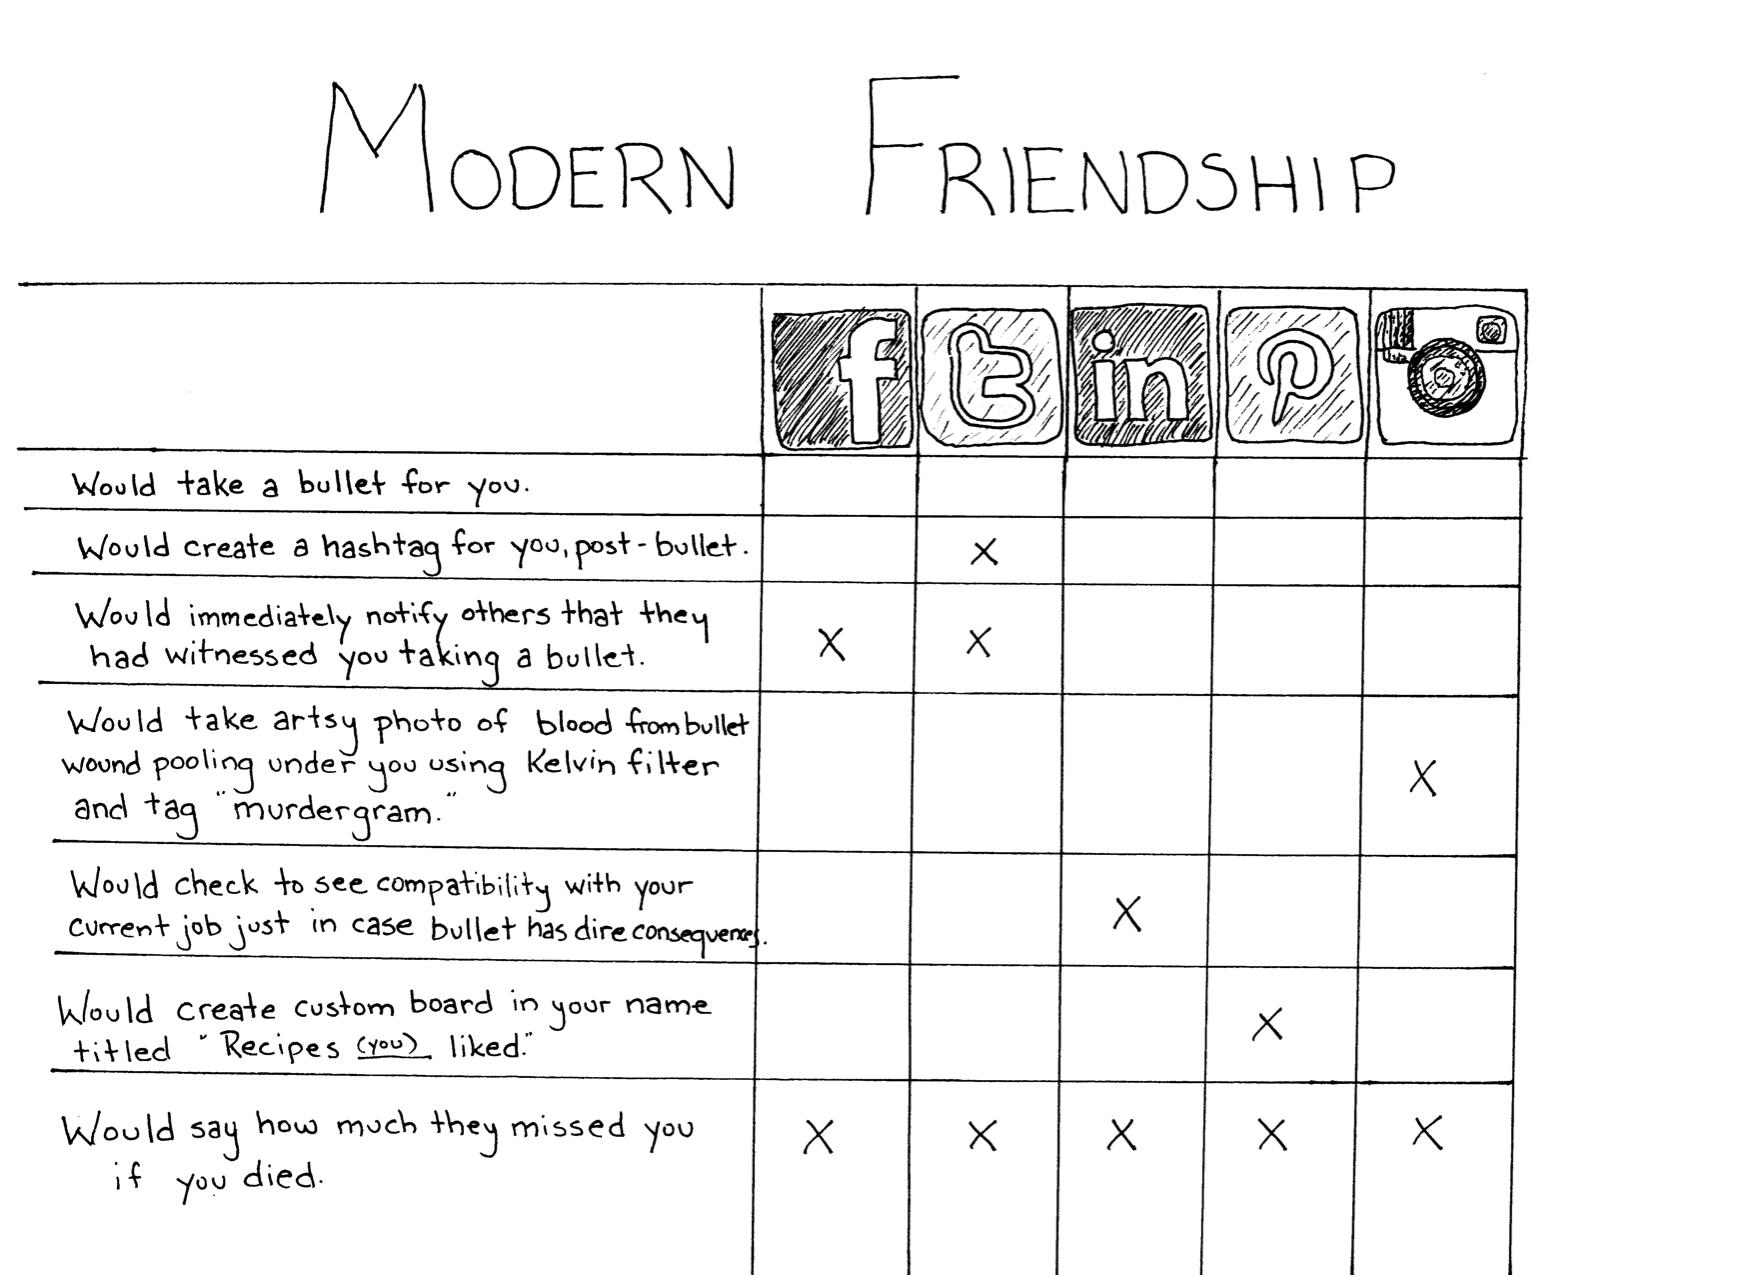 2013-03-20-modernfriendship.jpg